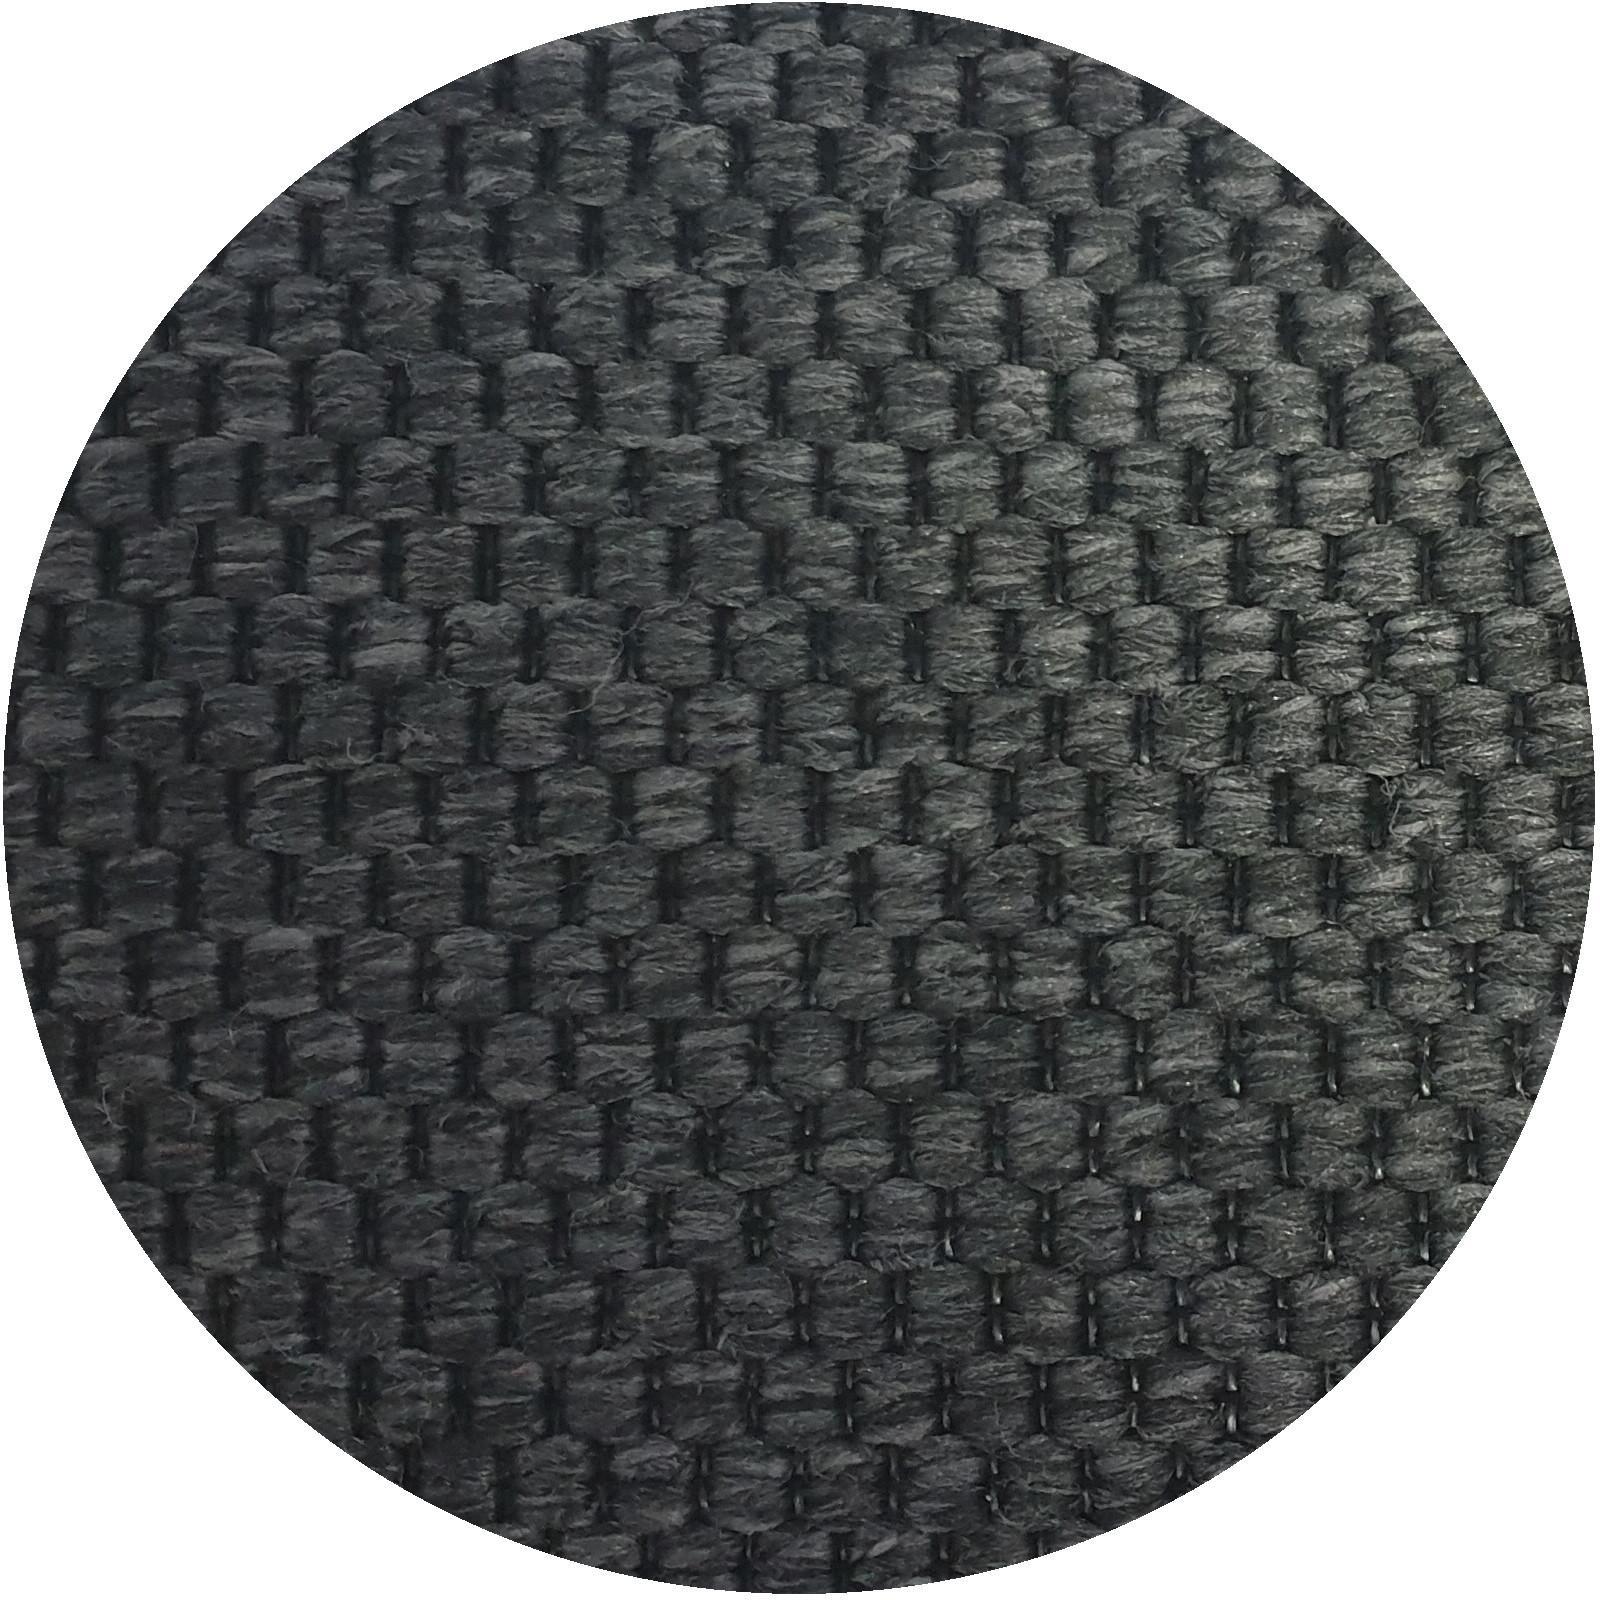 Vopi koberce Kusový koberec Nature antracit kulatý - 80x80 (průměr) kruh cm